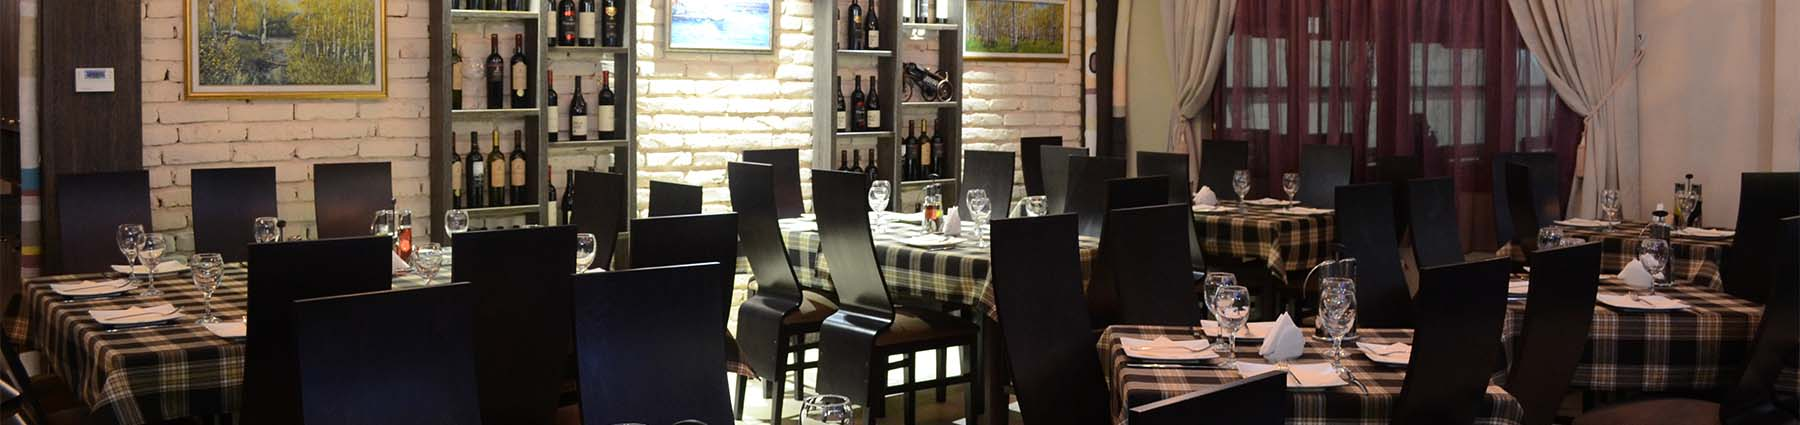 Restaurant Dei Fratelli